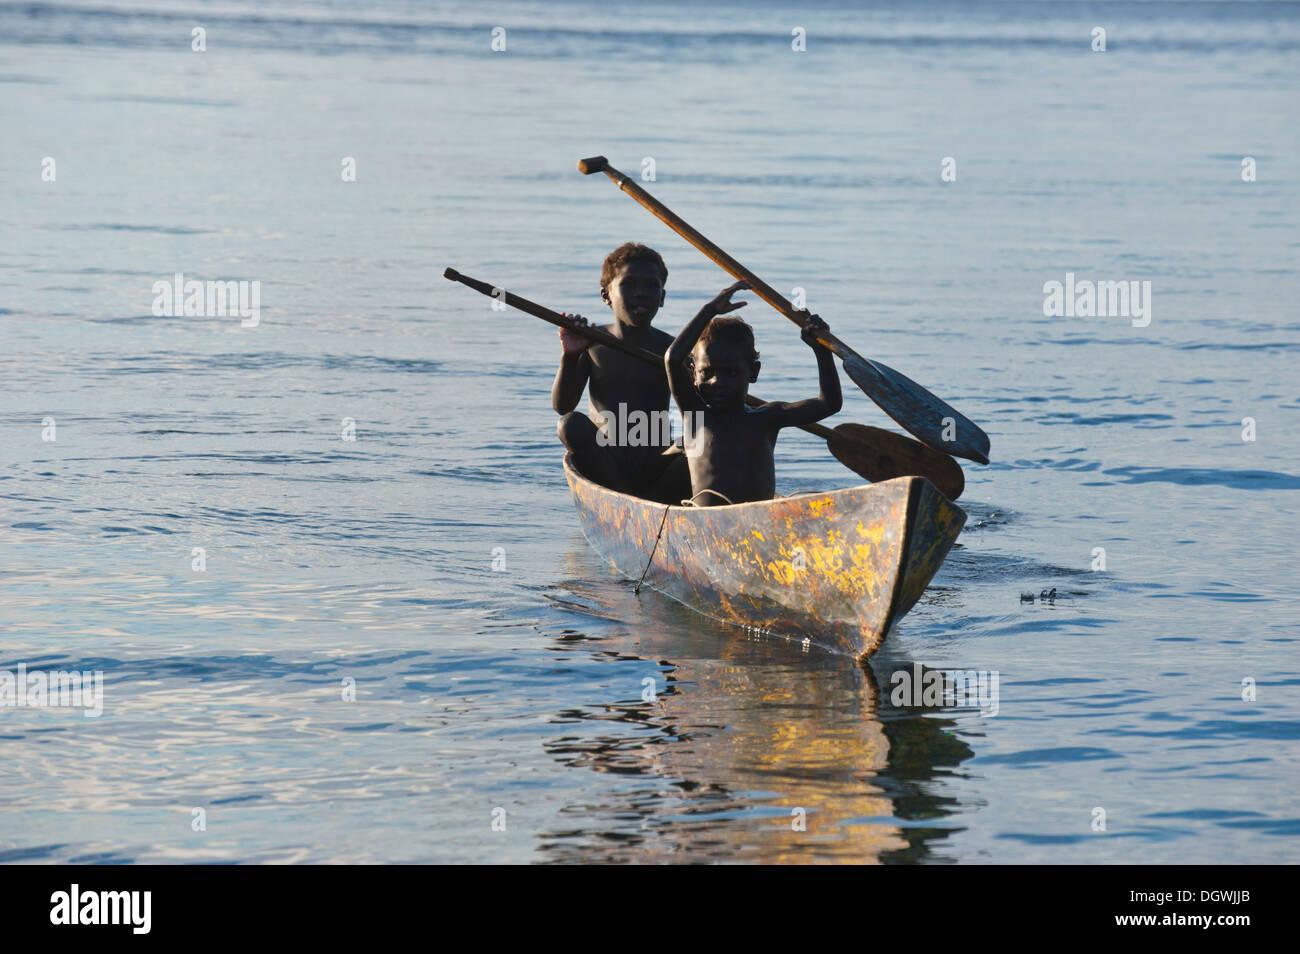 Boys in a canoe in backlight, Marovo Lagoon, Western Province, Solomon Islands - Stock Image